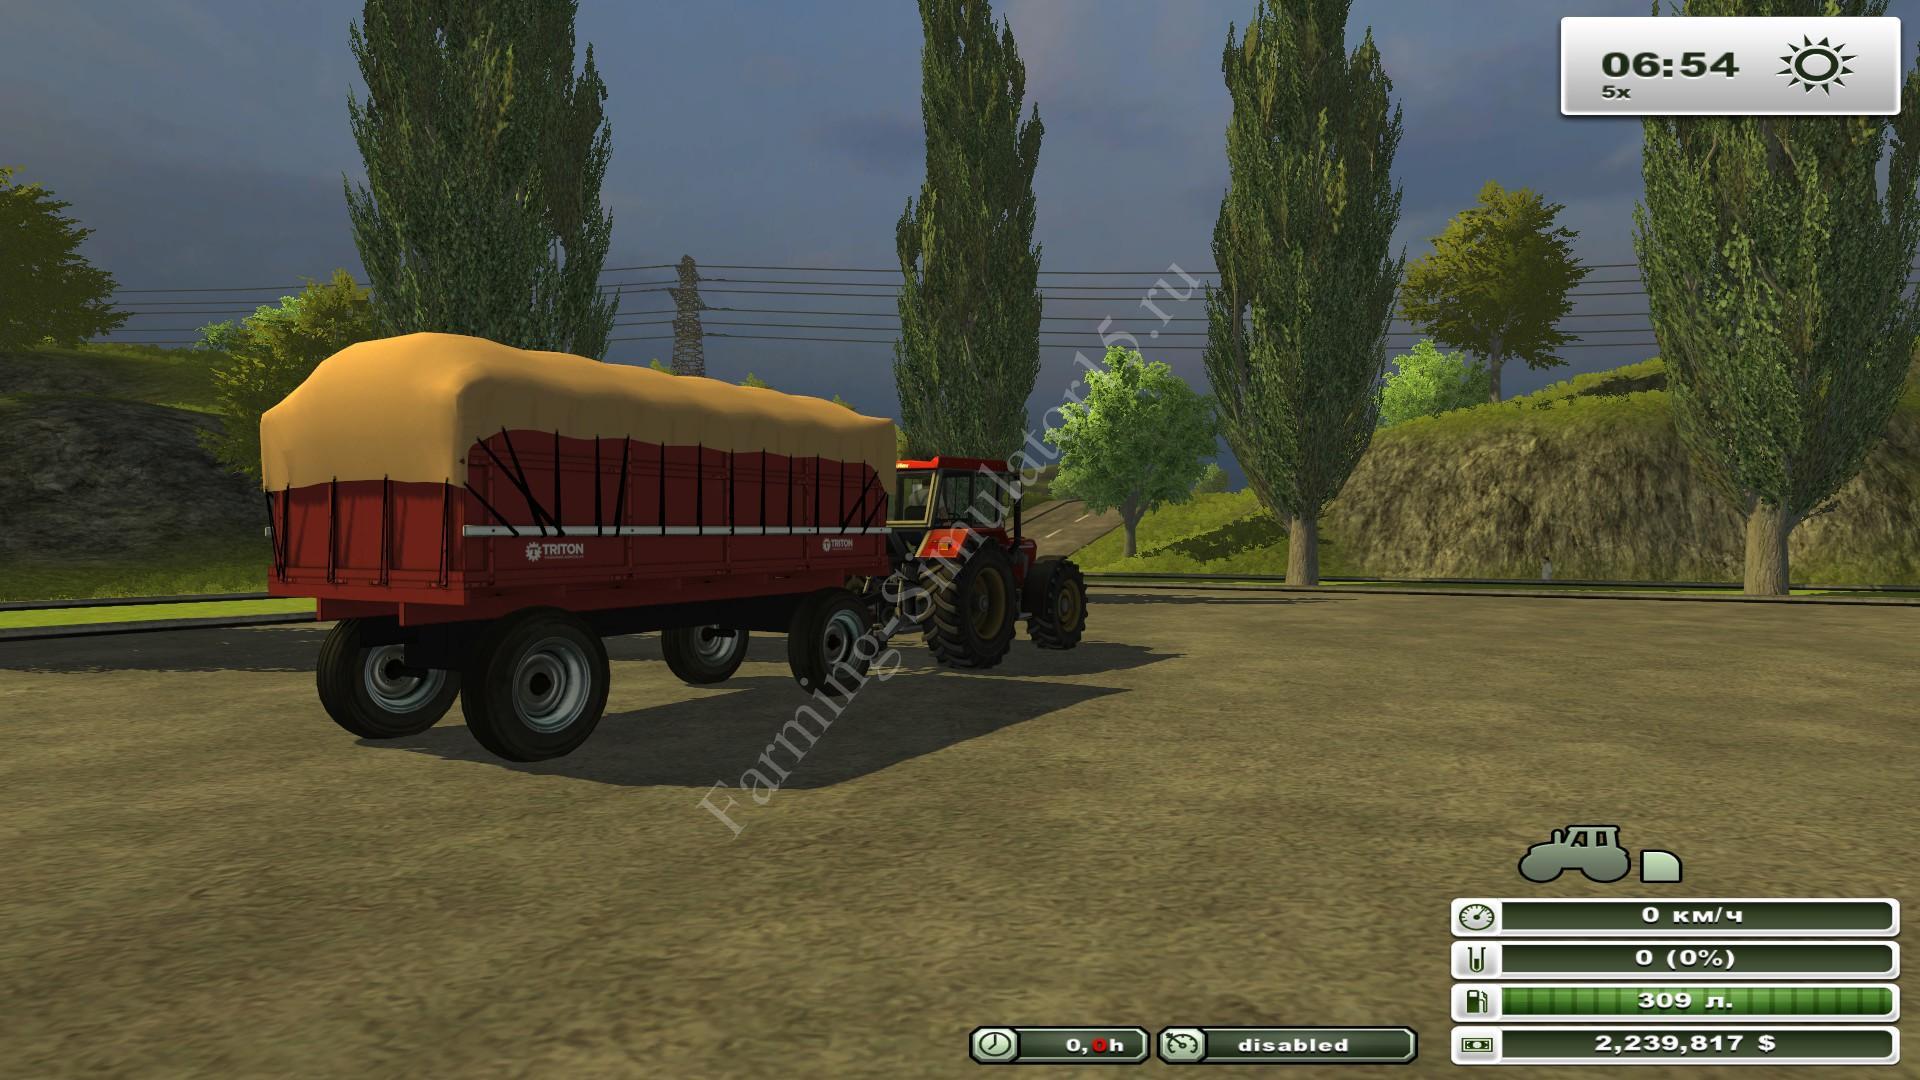 Triton lavavel V 1.0 - мод прицепа с поворотным кругом Farming Simulator 13